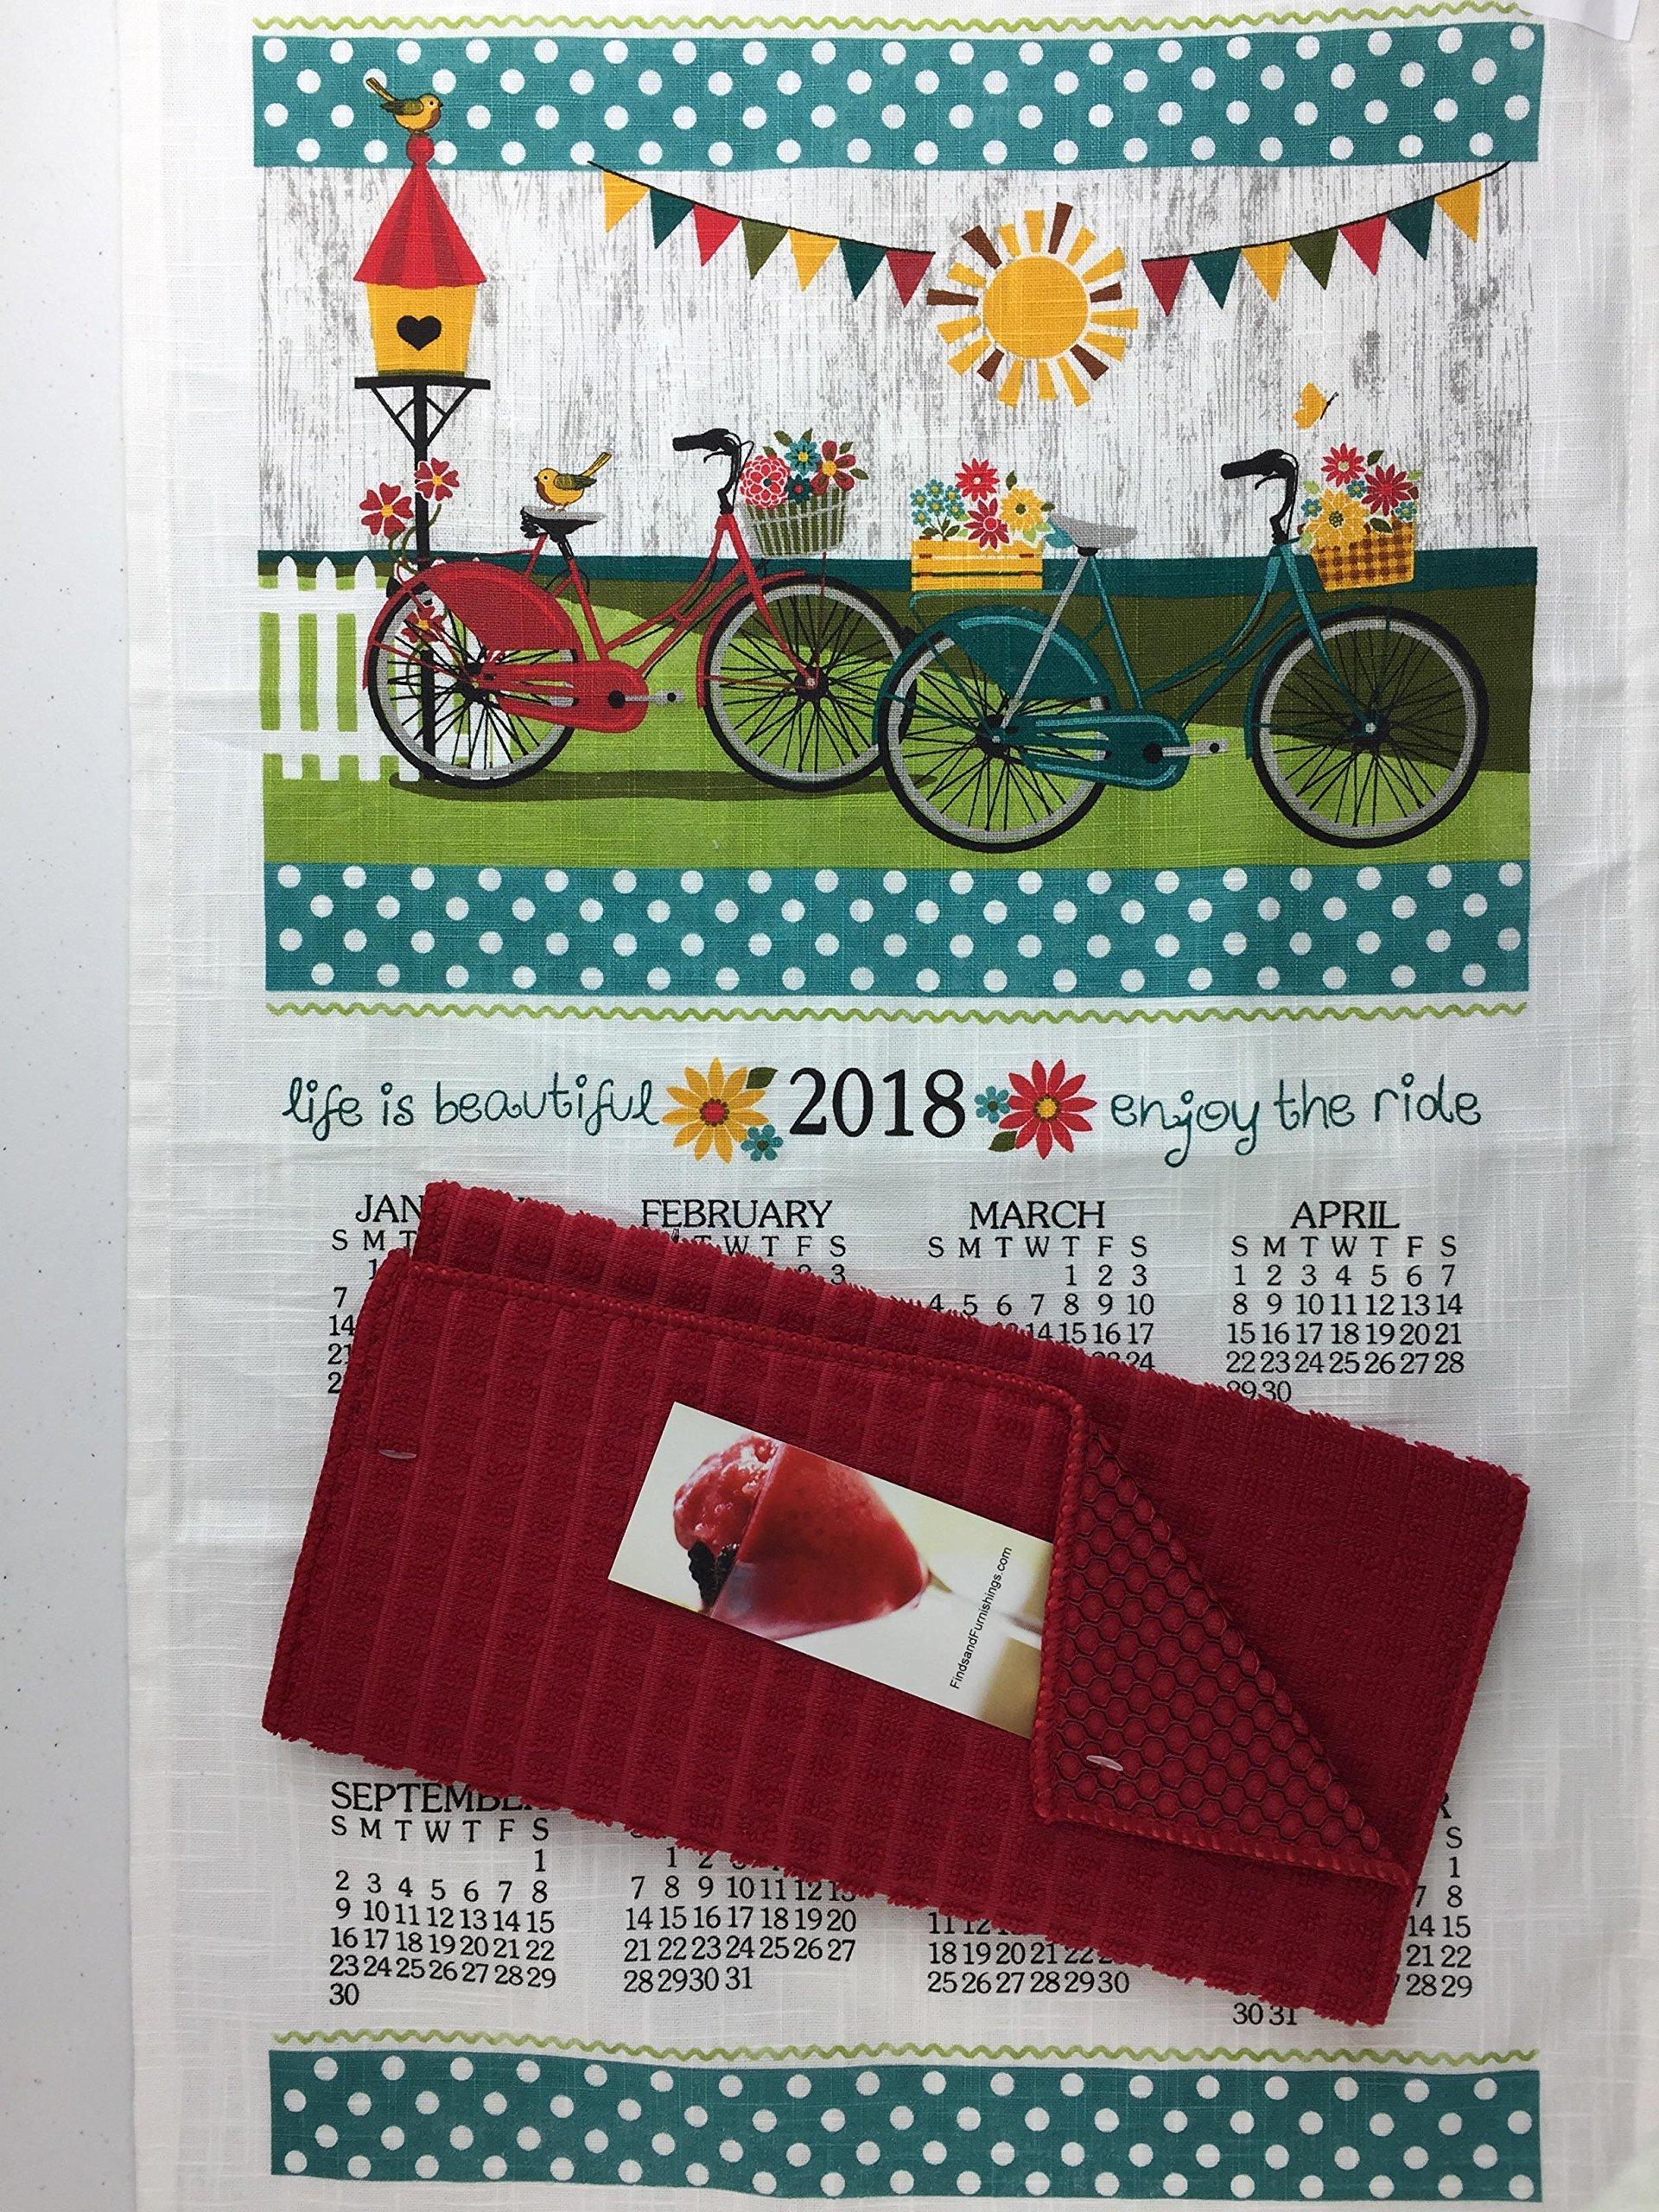 Finds and Furnishings 2018 Enjoy The Ride Kitchen Dish Towel Calendar & Kitchen Drying Mat Bundle Kitchen Linen Calendar Towel and Kitchen Dish Drying Mat 3 Piece Bundle